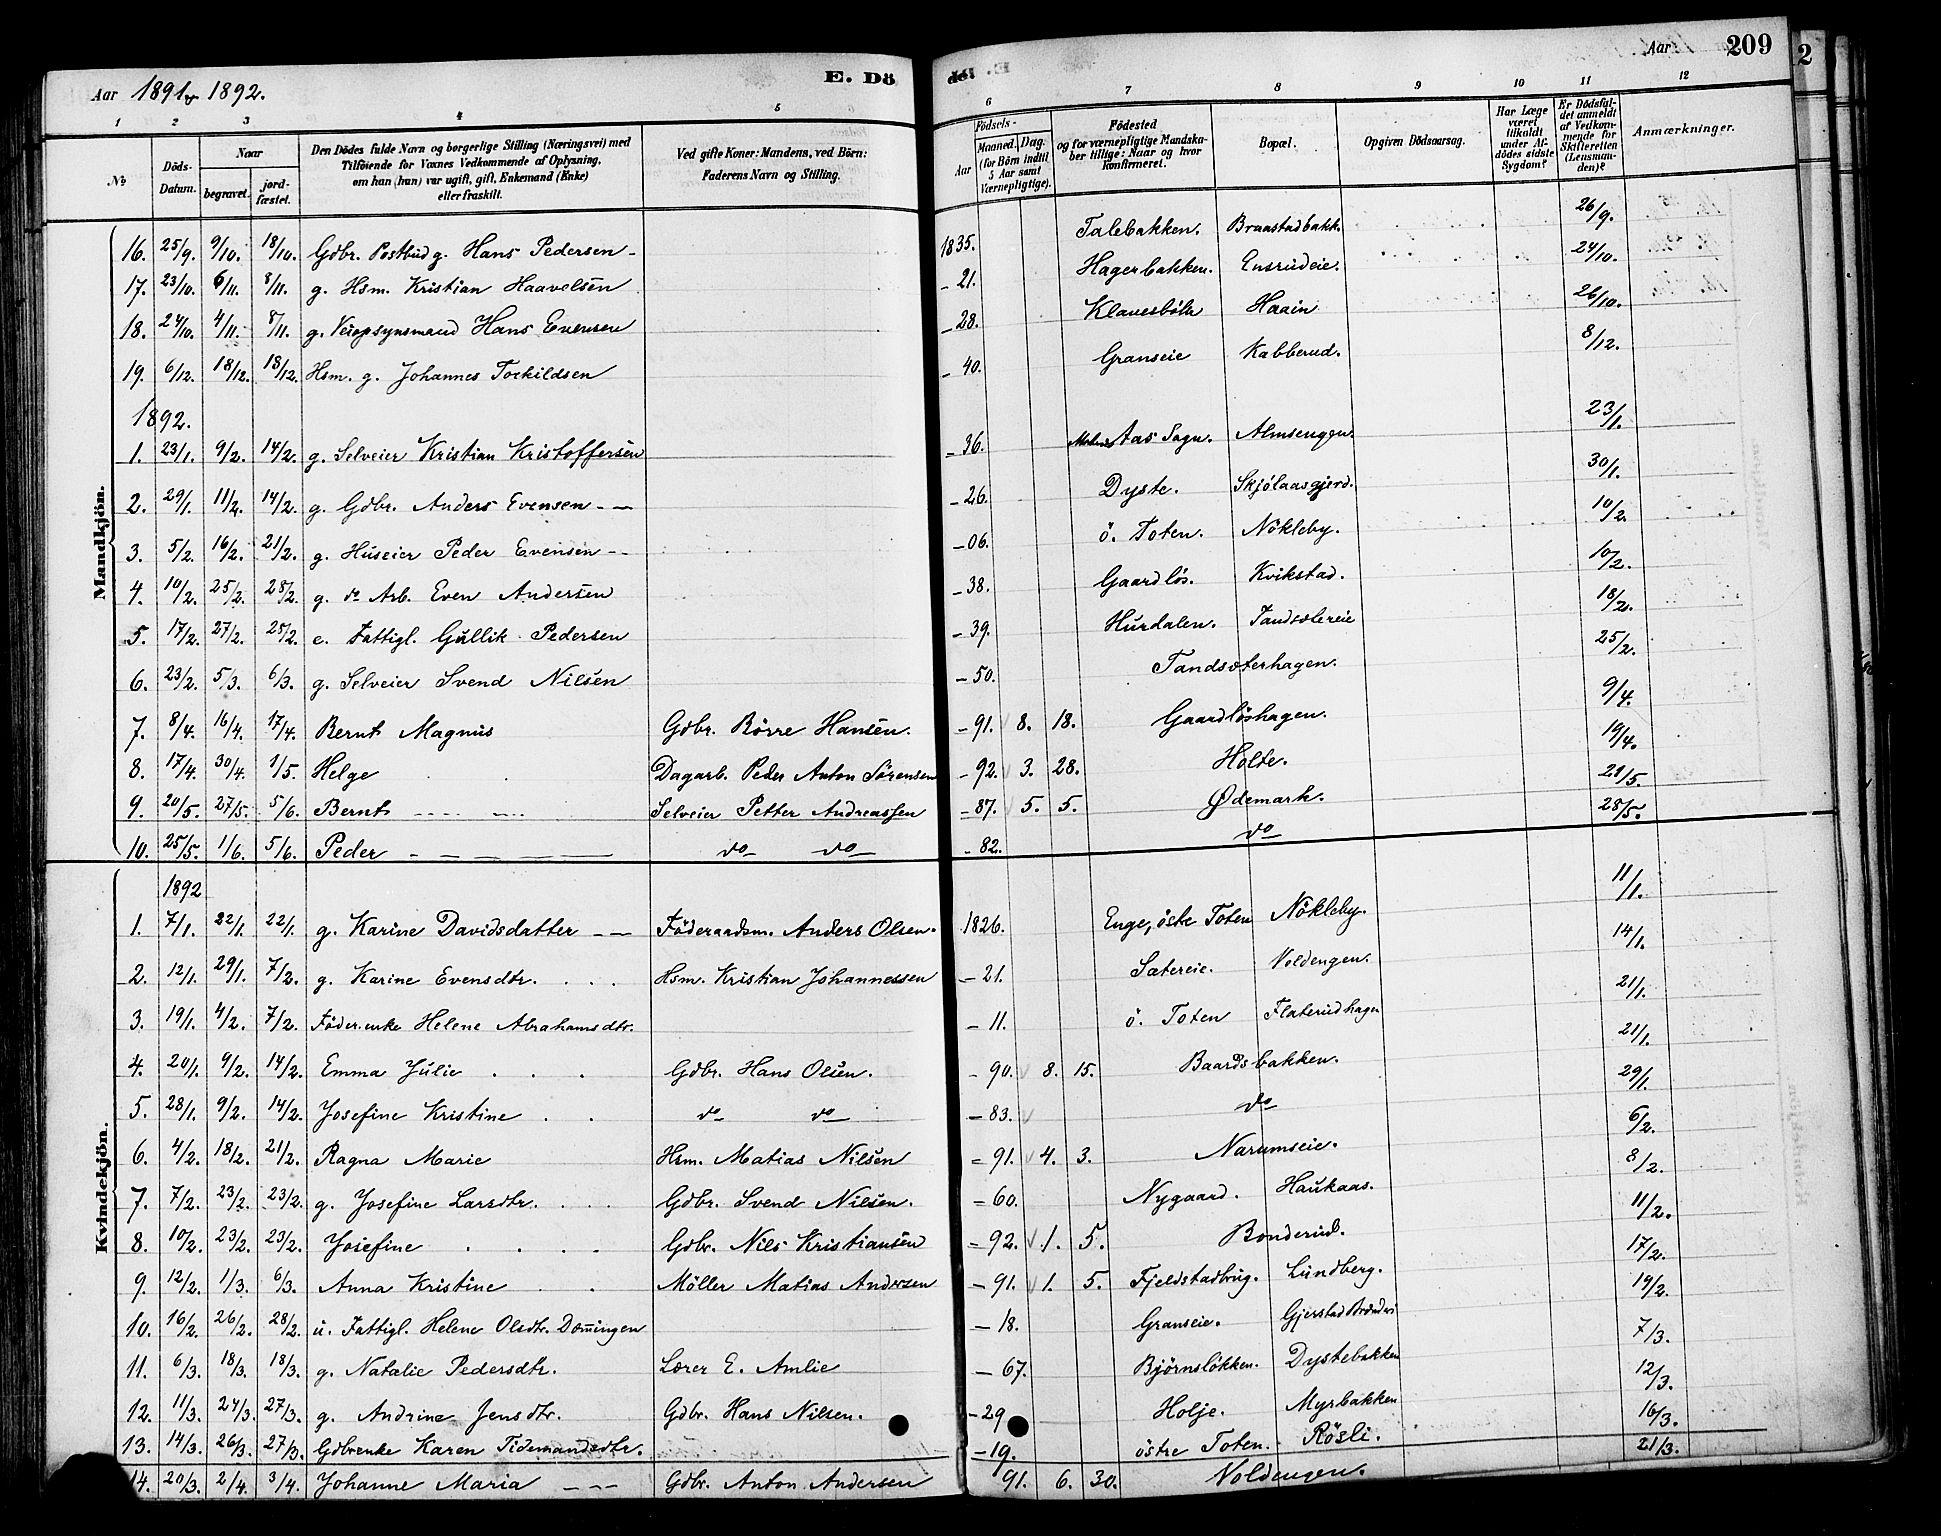 SAH, Vestre Toten prestekontor, H/Ha/Haa/L0010: Ministerialbok nr. 10, 1878-1894, s. 209